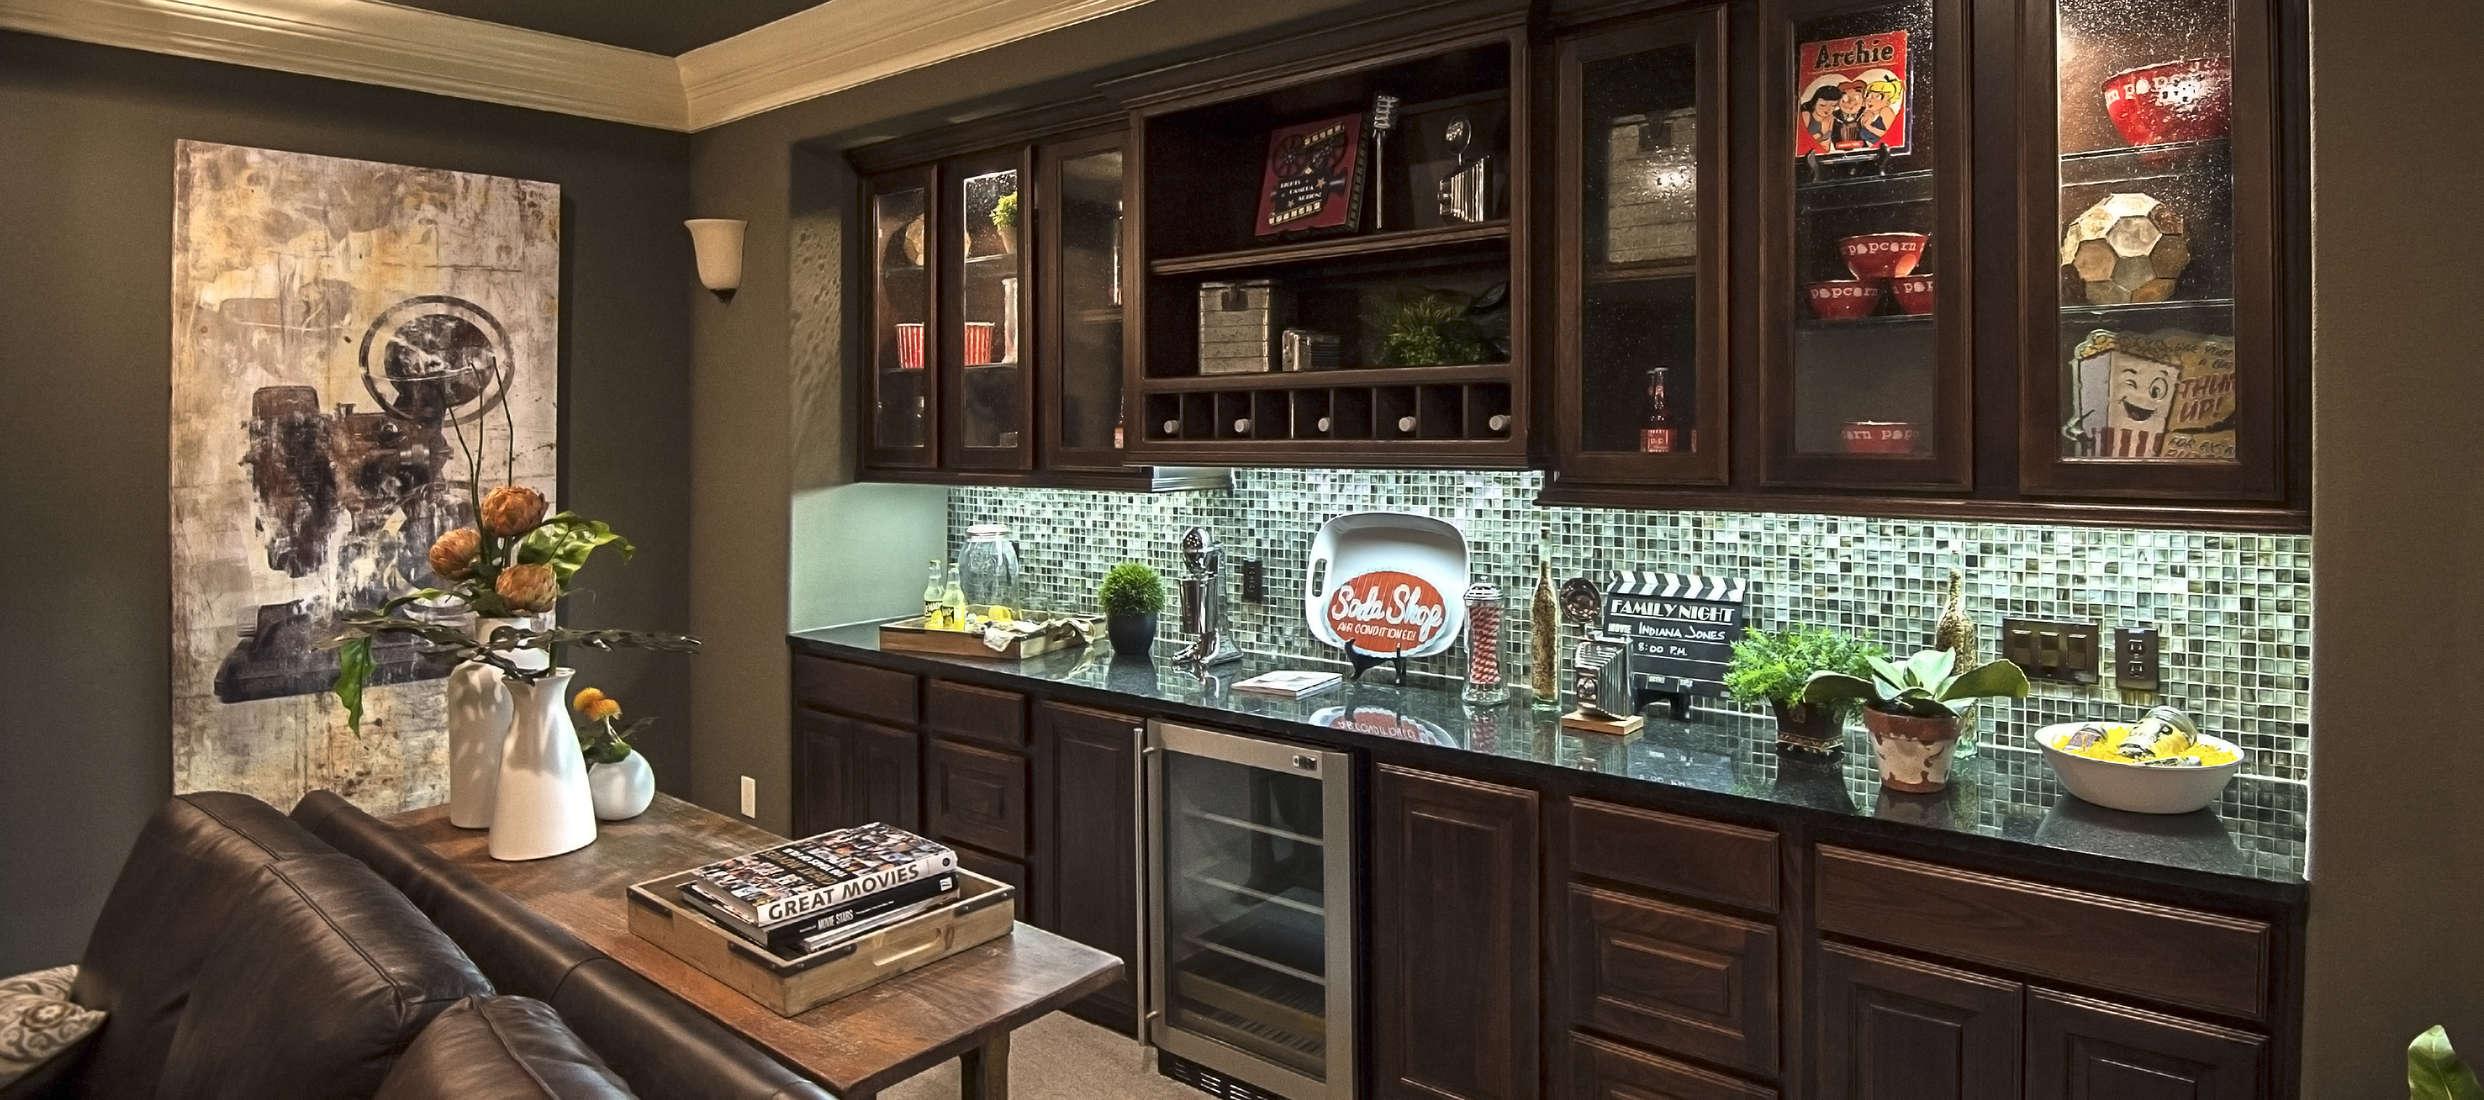 JKraft Inc  Custom cabinets by Houston cabinet company